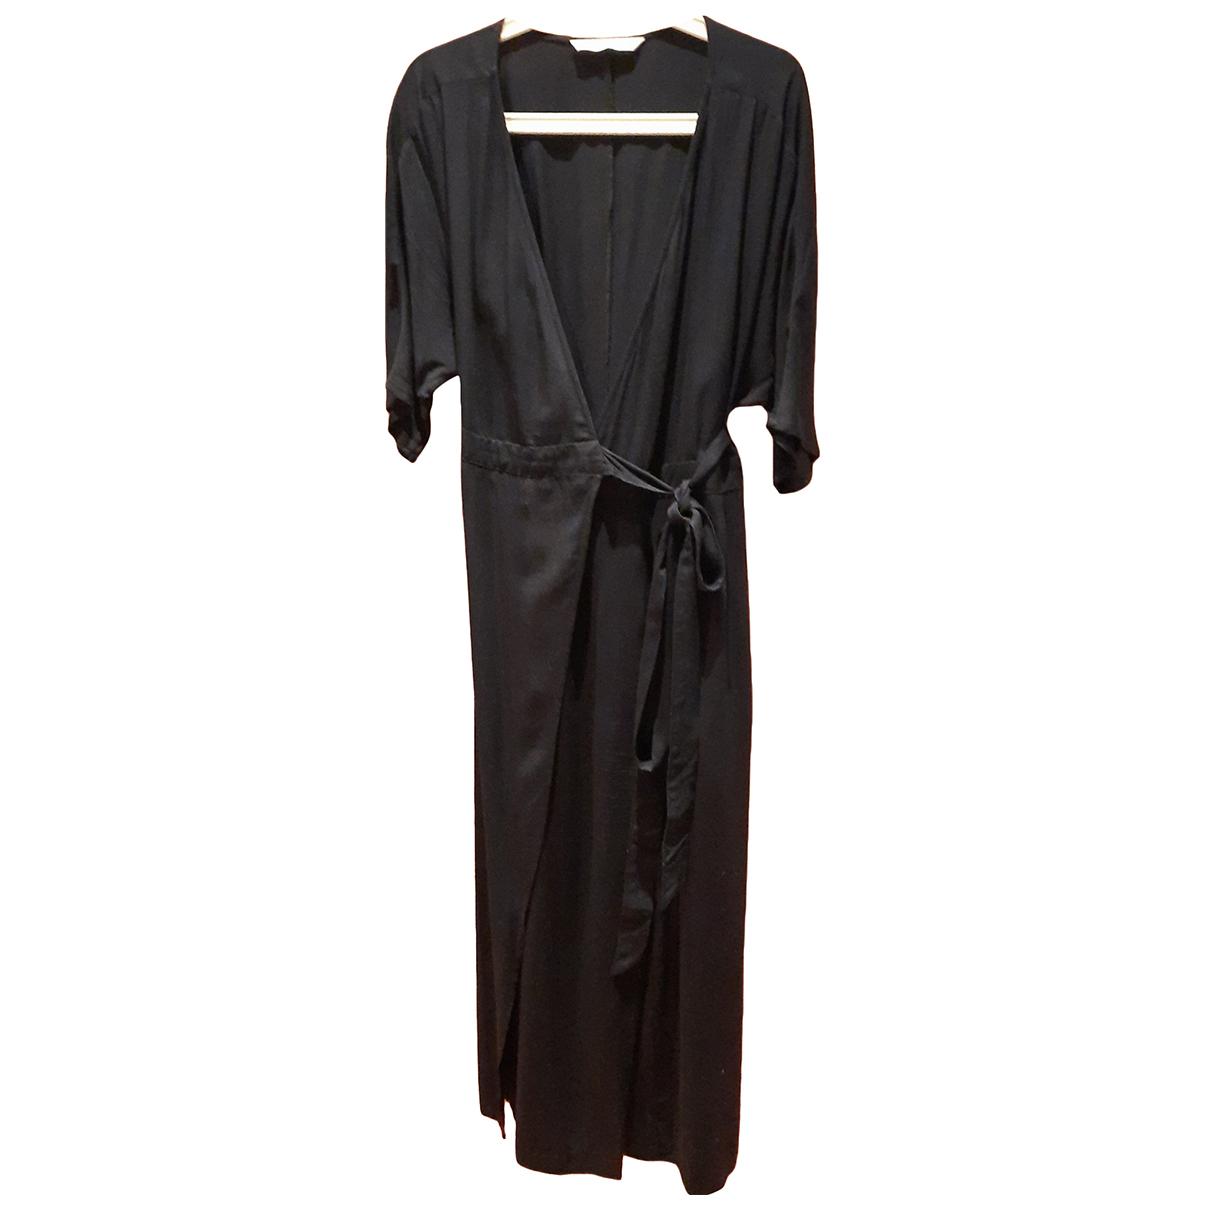 Zara - Combinaison   pour femme en coton - marine